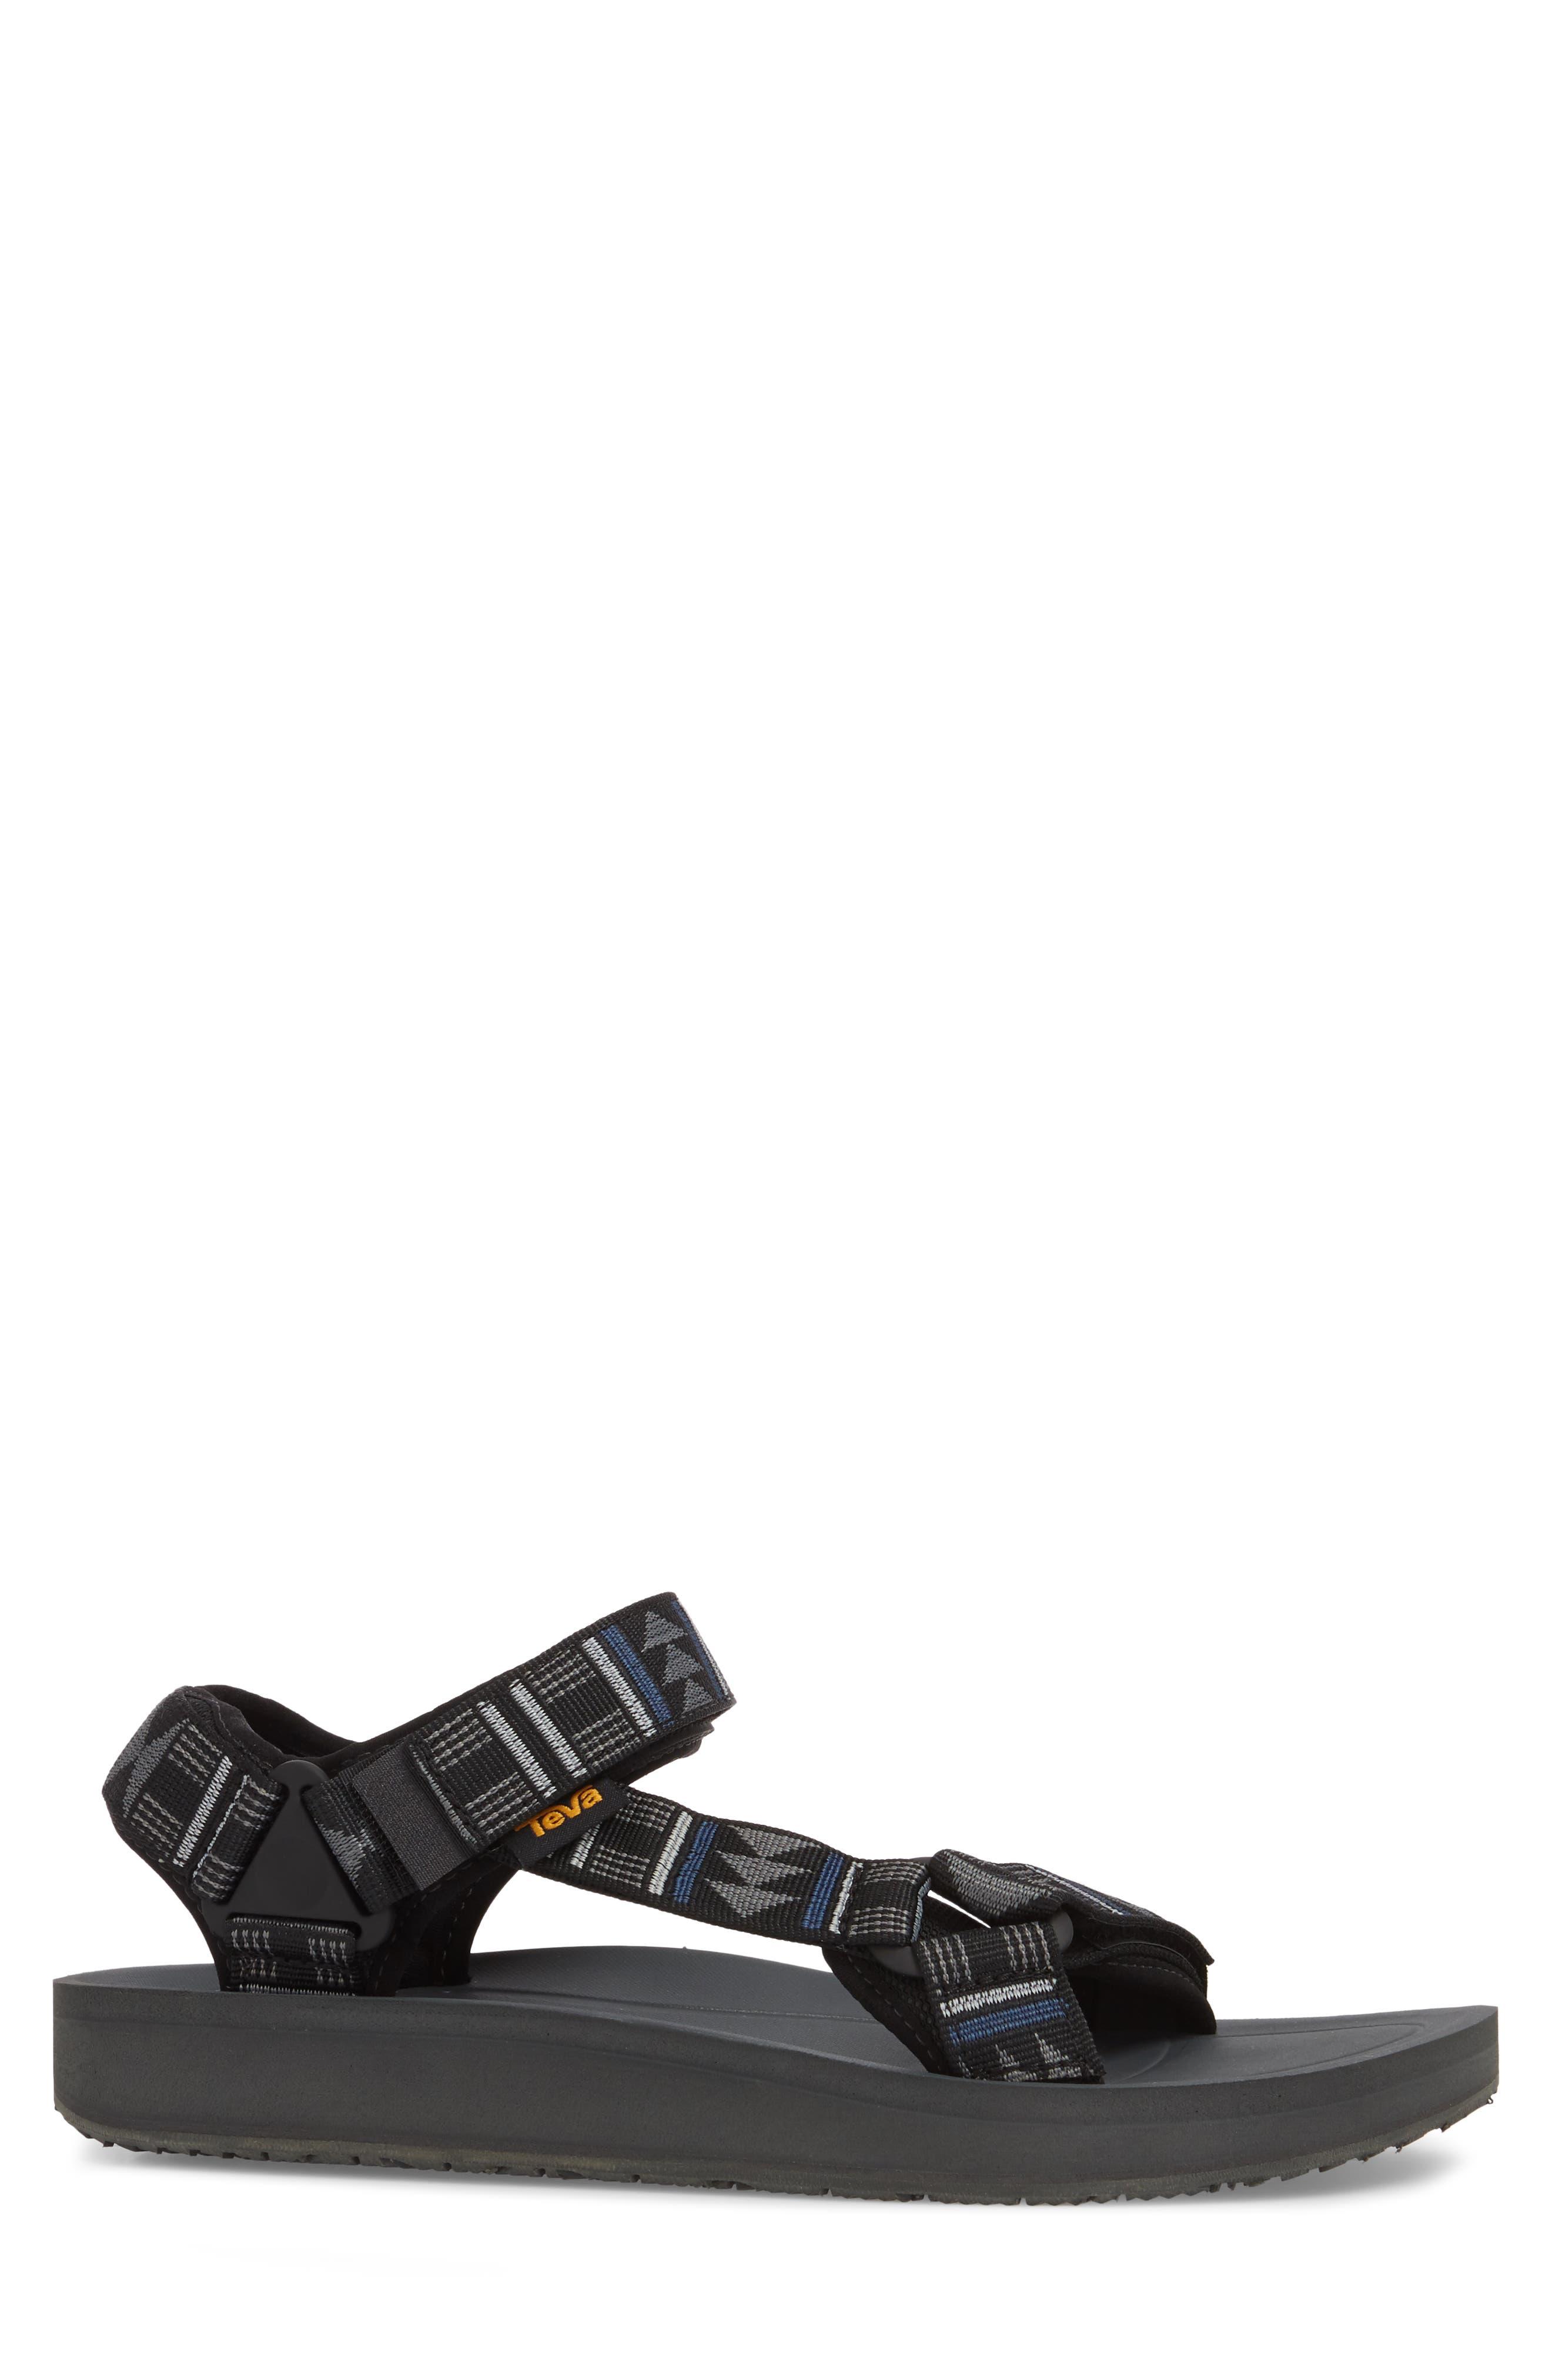 Original Universal Premier Sandal,                             Alternate thumbnail 3, color,                             GREY NYLON